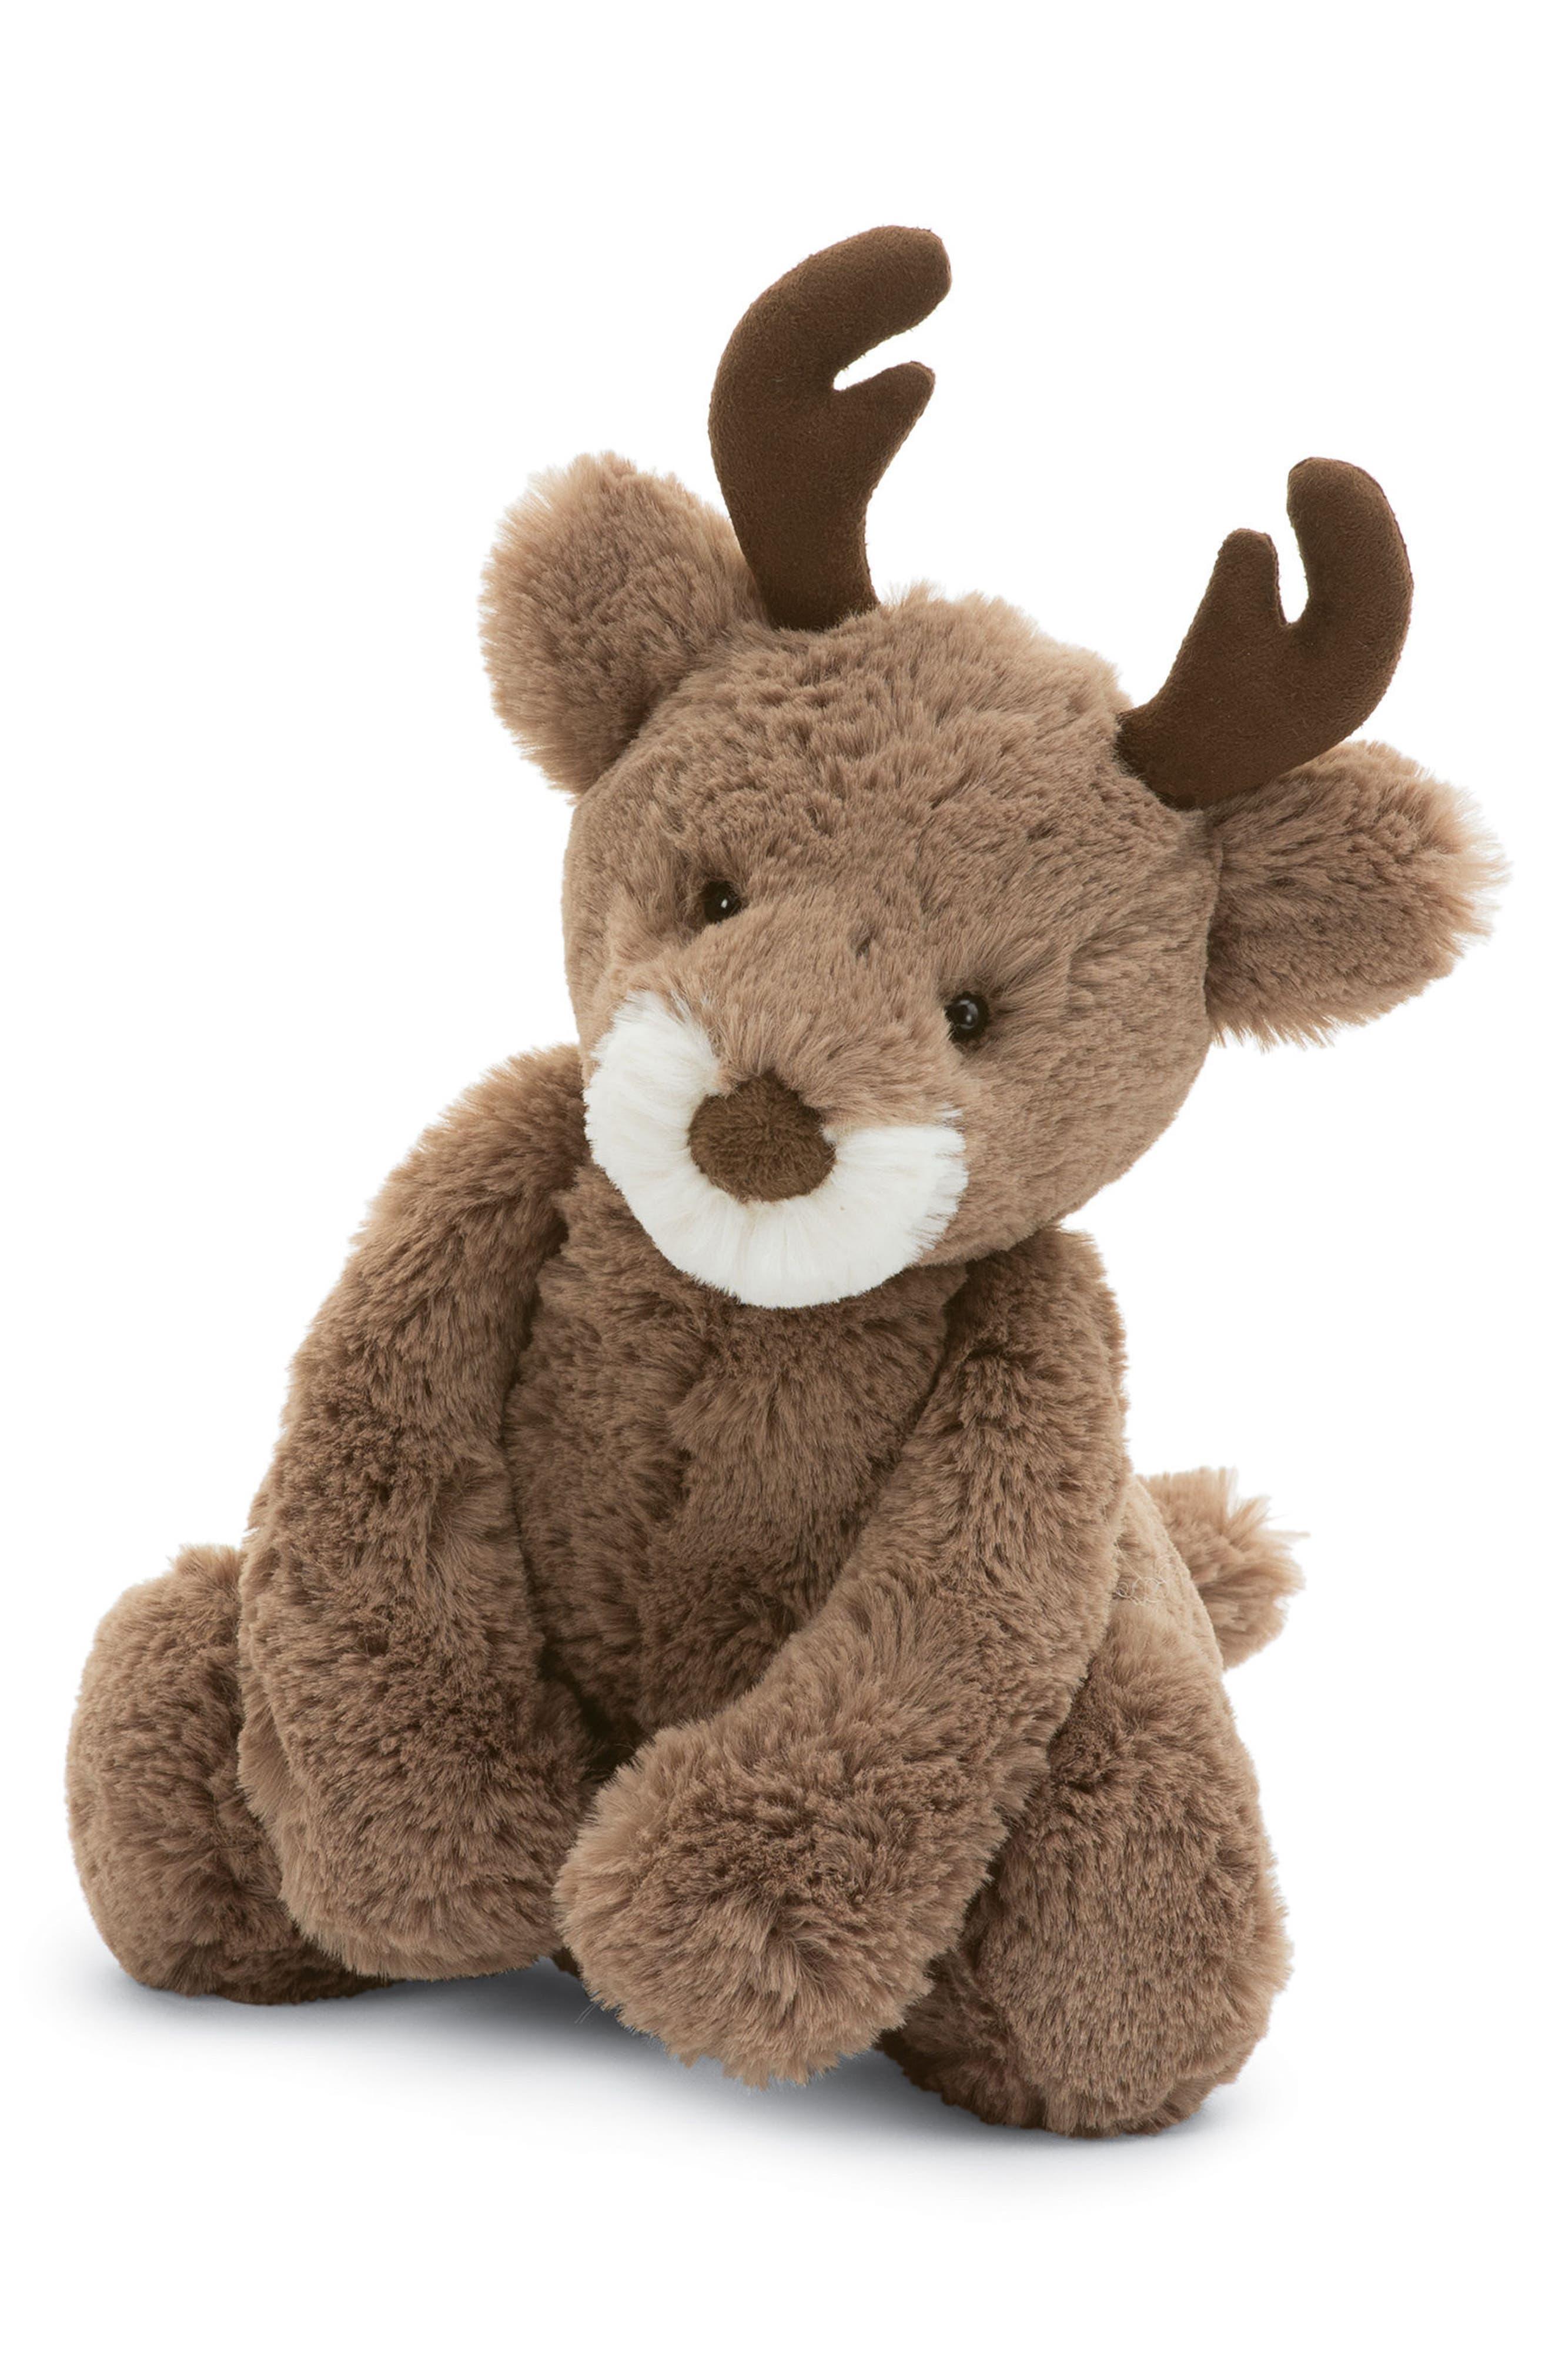 Alternate Image 1 Selected - Jellycat Medium Bashful Reindeer Stuffed Animal